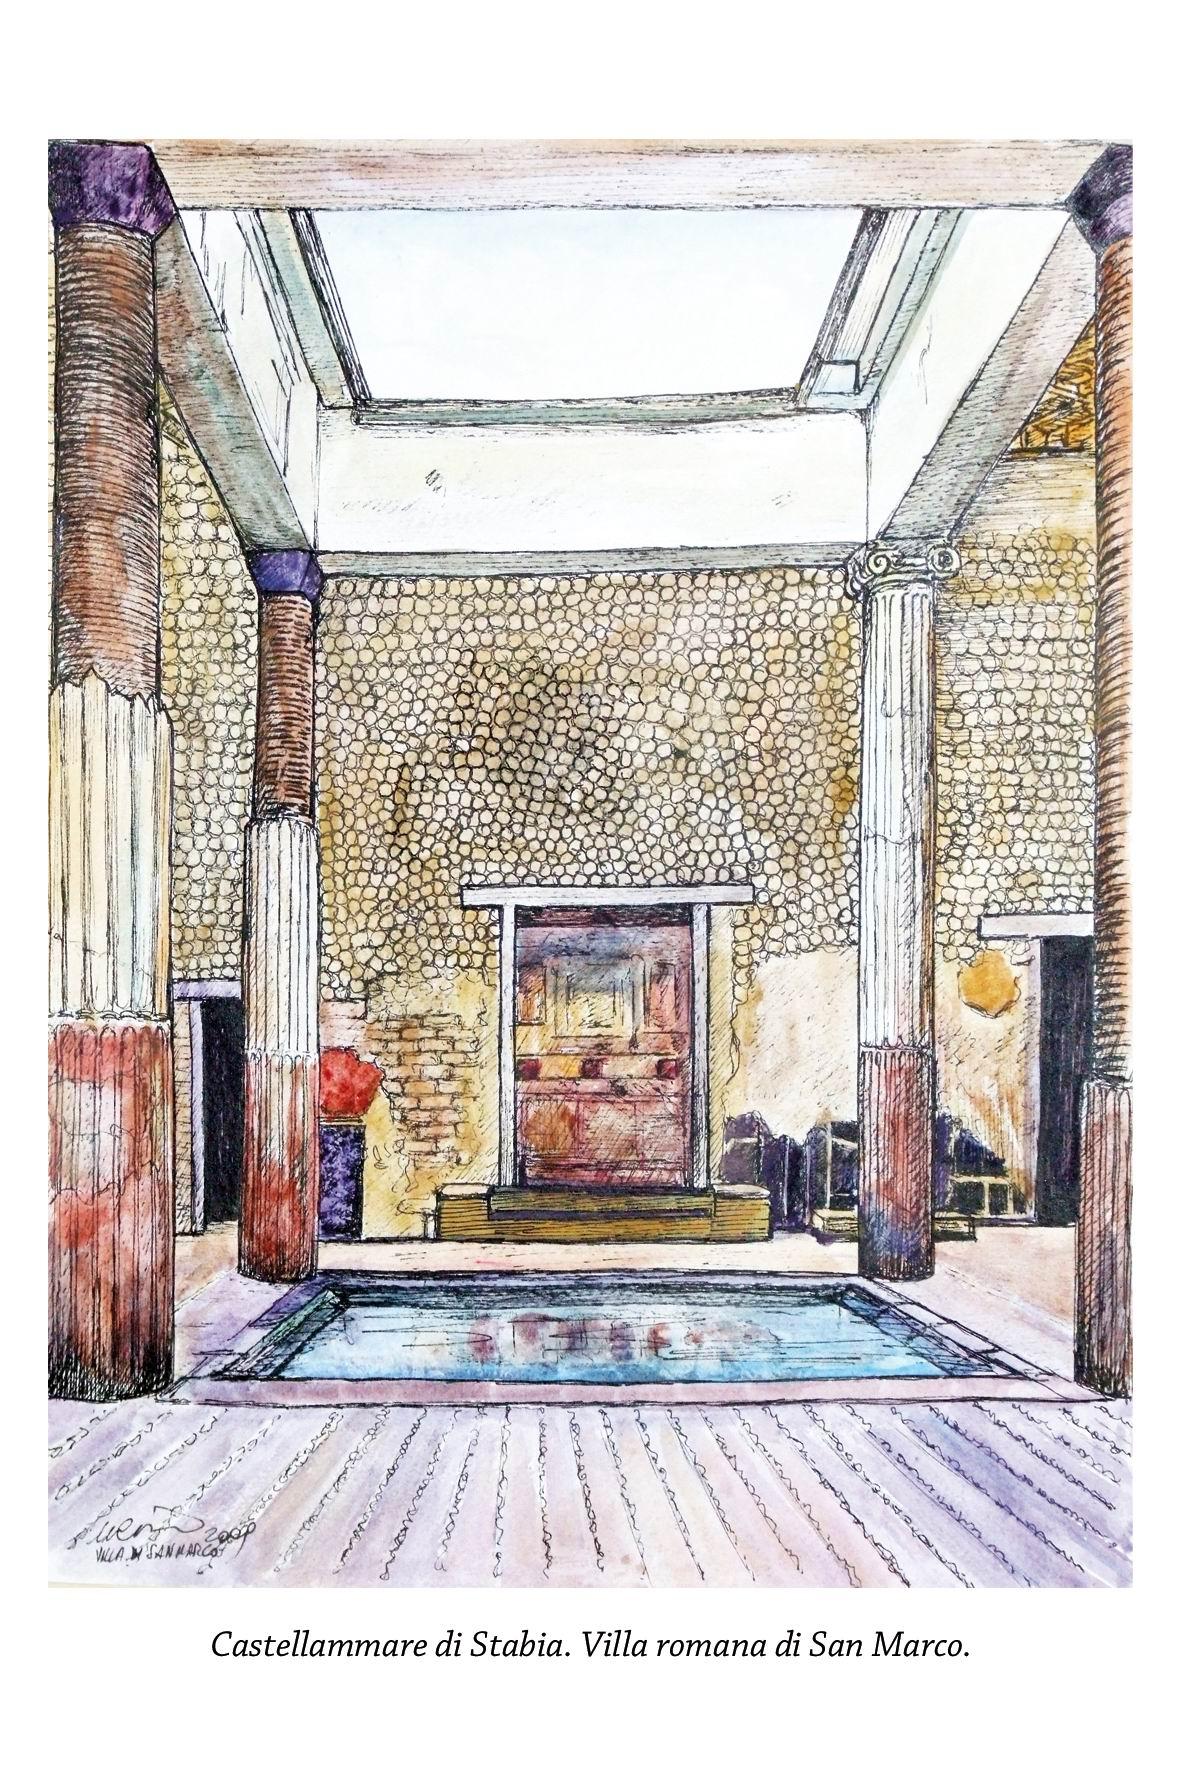 Il frigidarium di Villa San Marco (pittura del maestro Umberto Cesino)